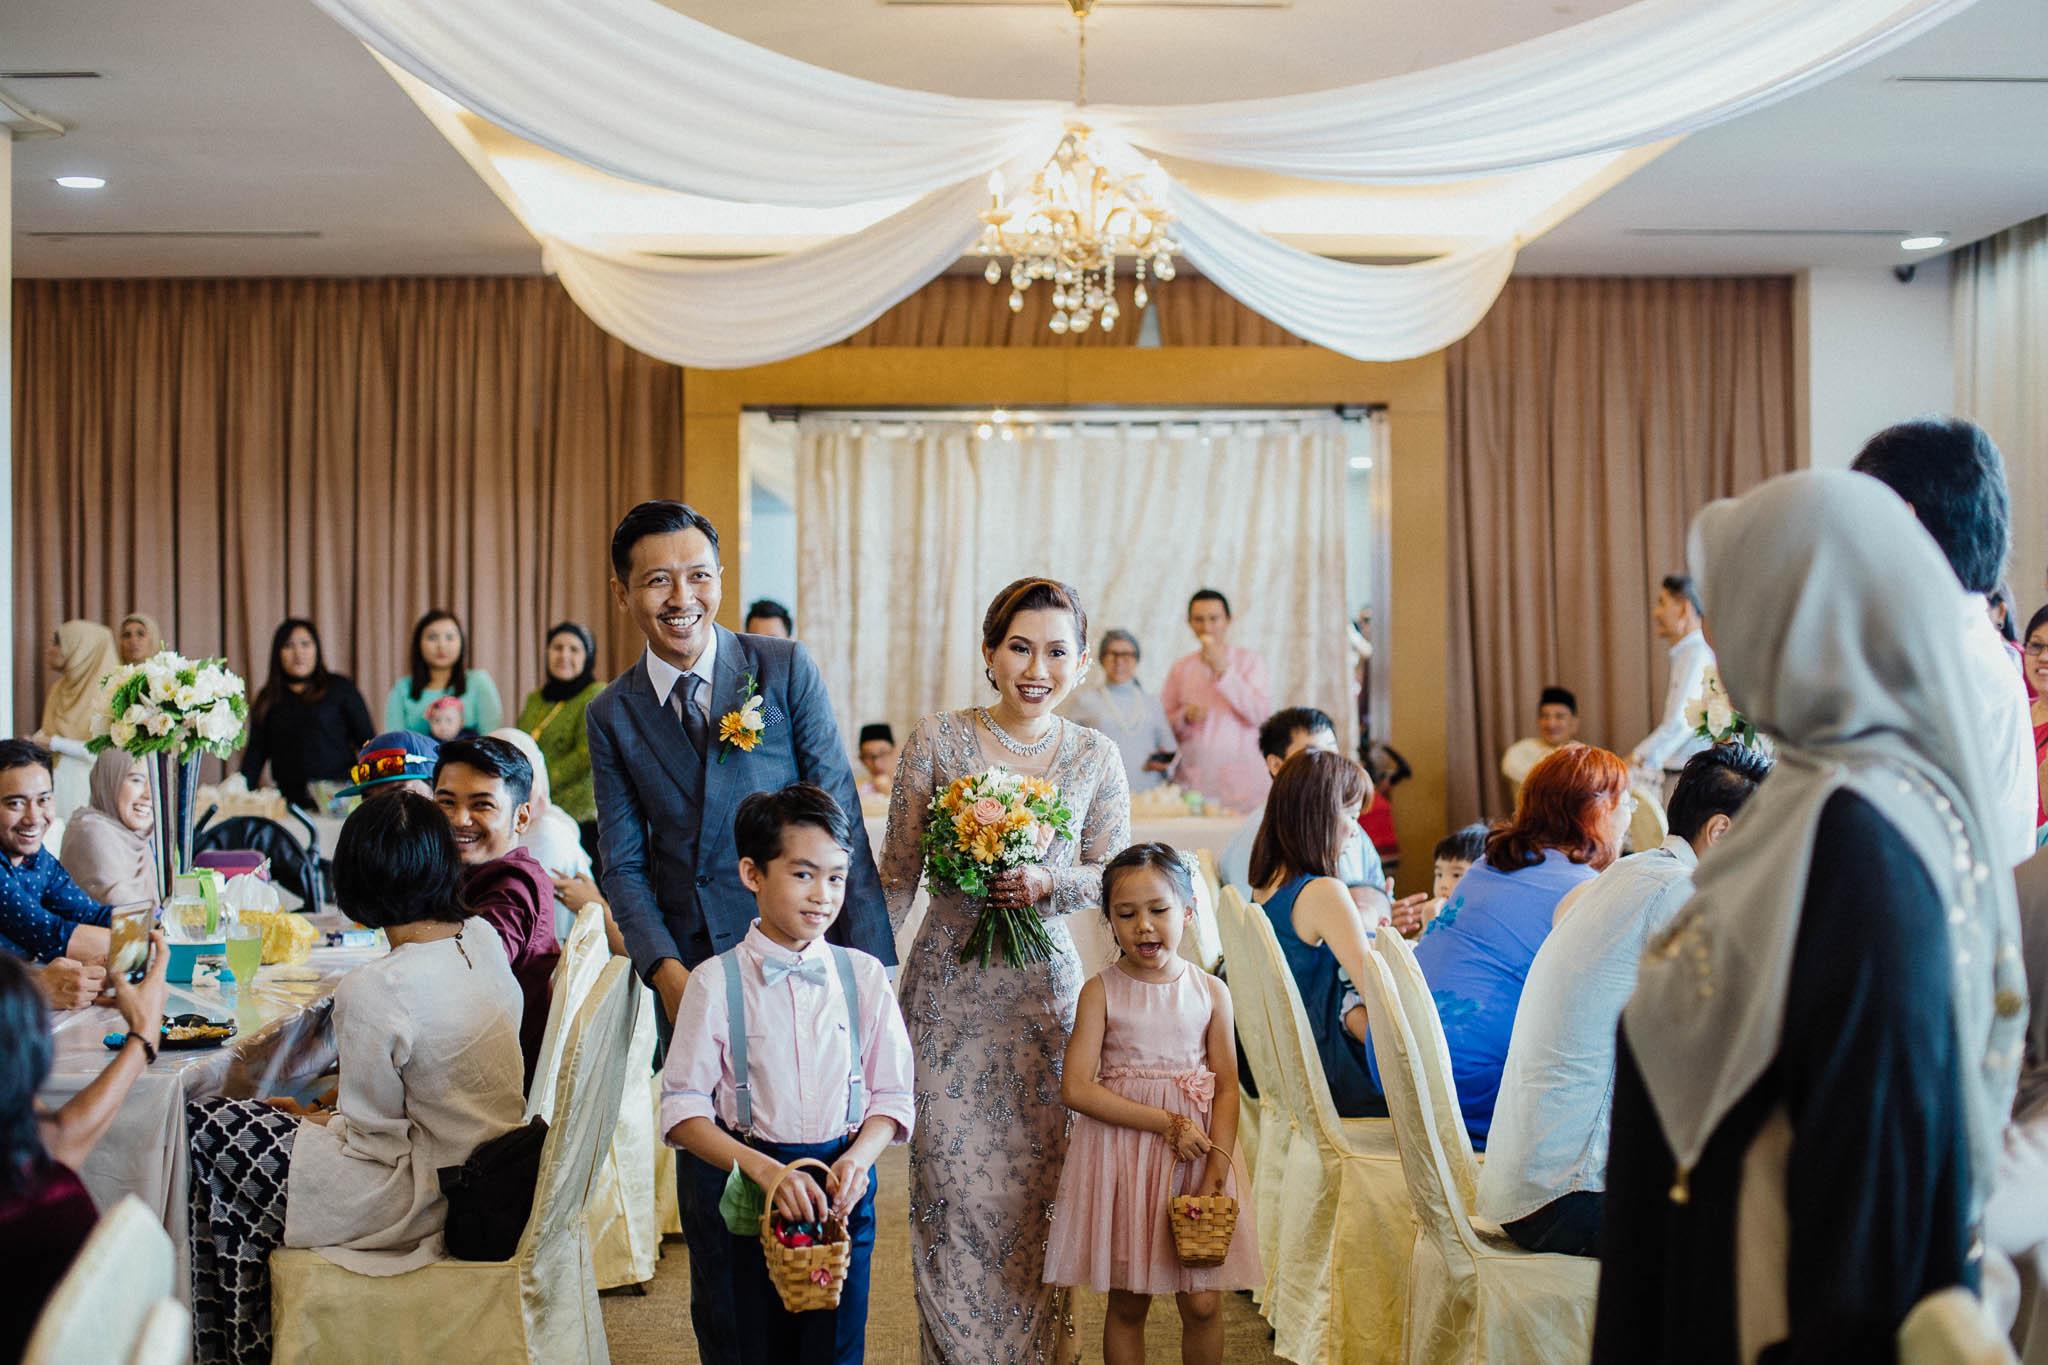 singapore-wedding-photographer-addafiq-nufail-047.jpg